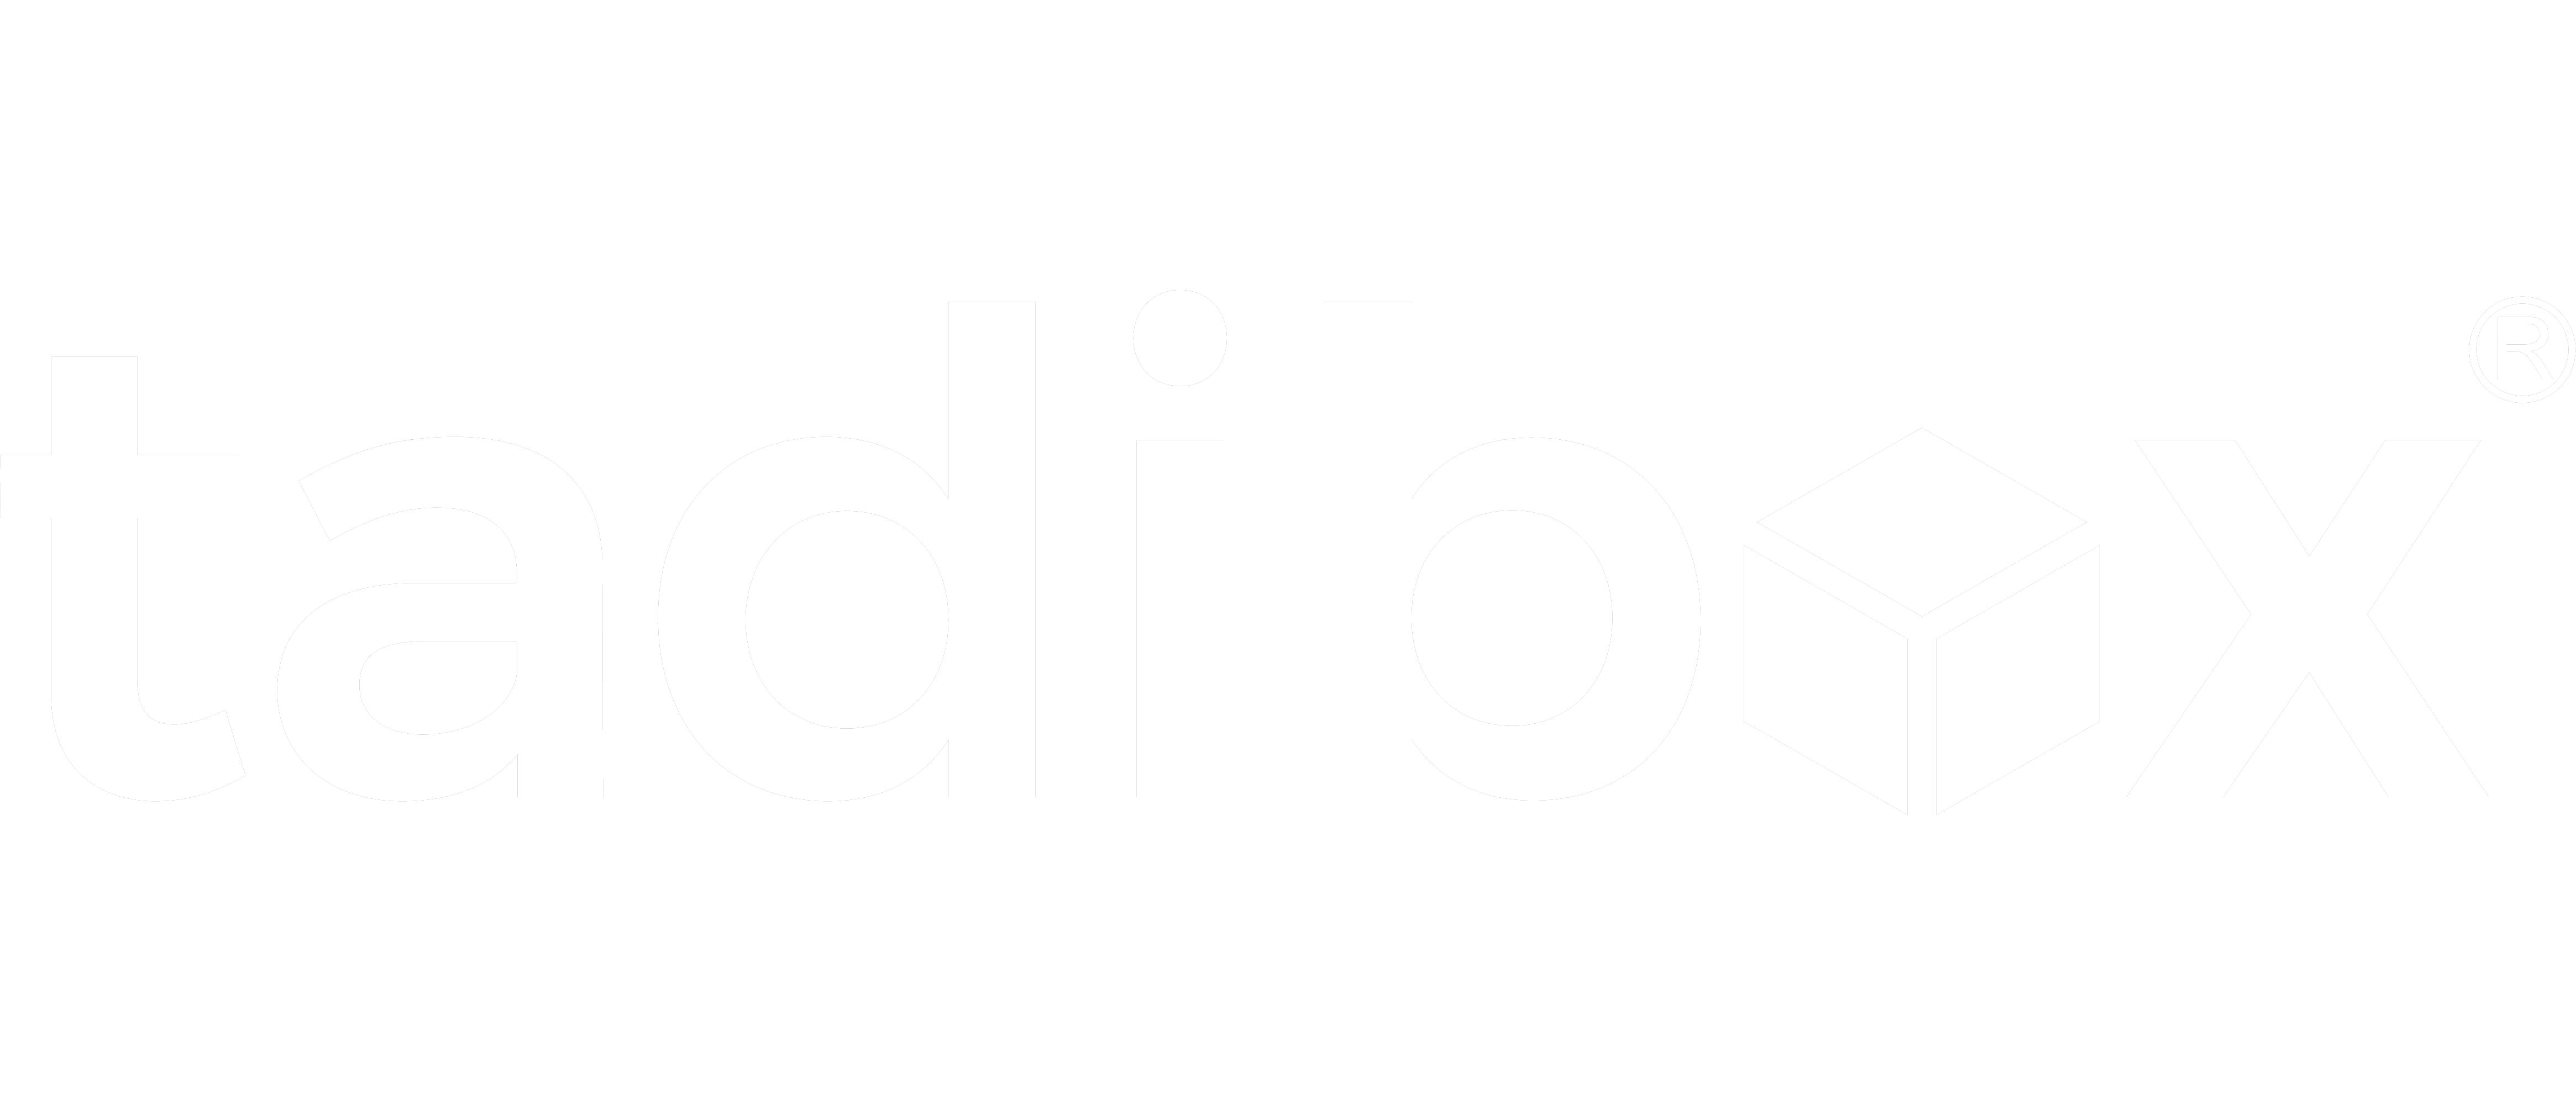 Tadibox